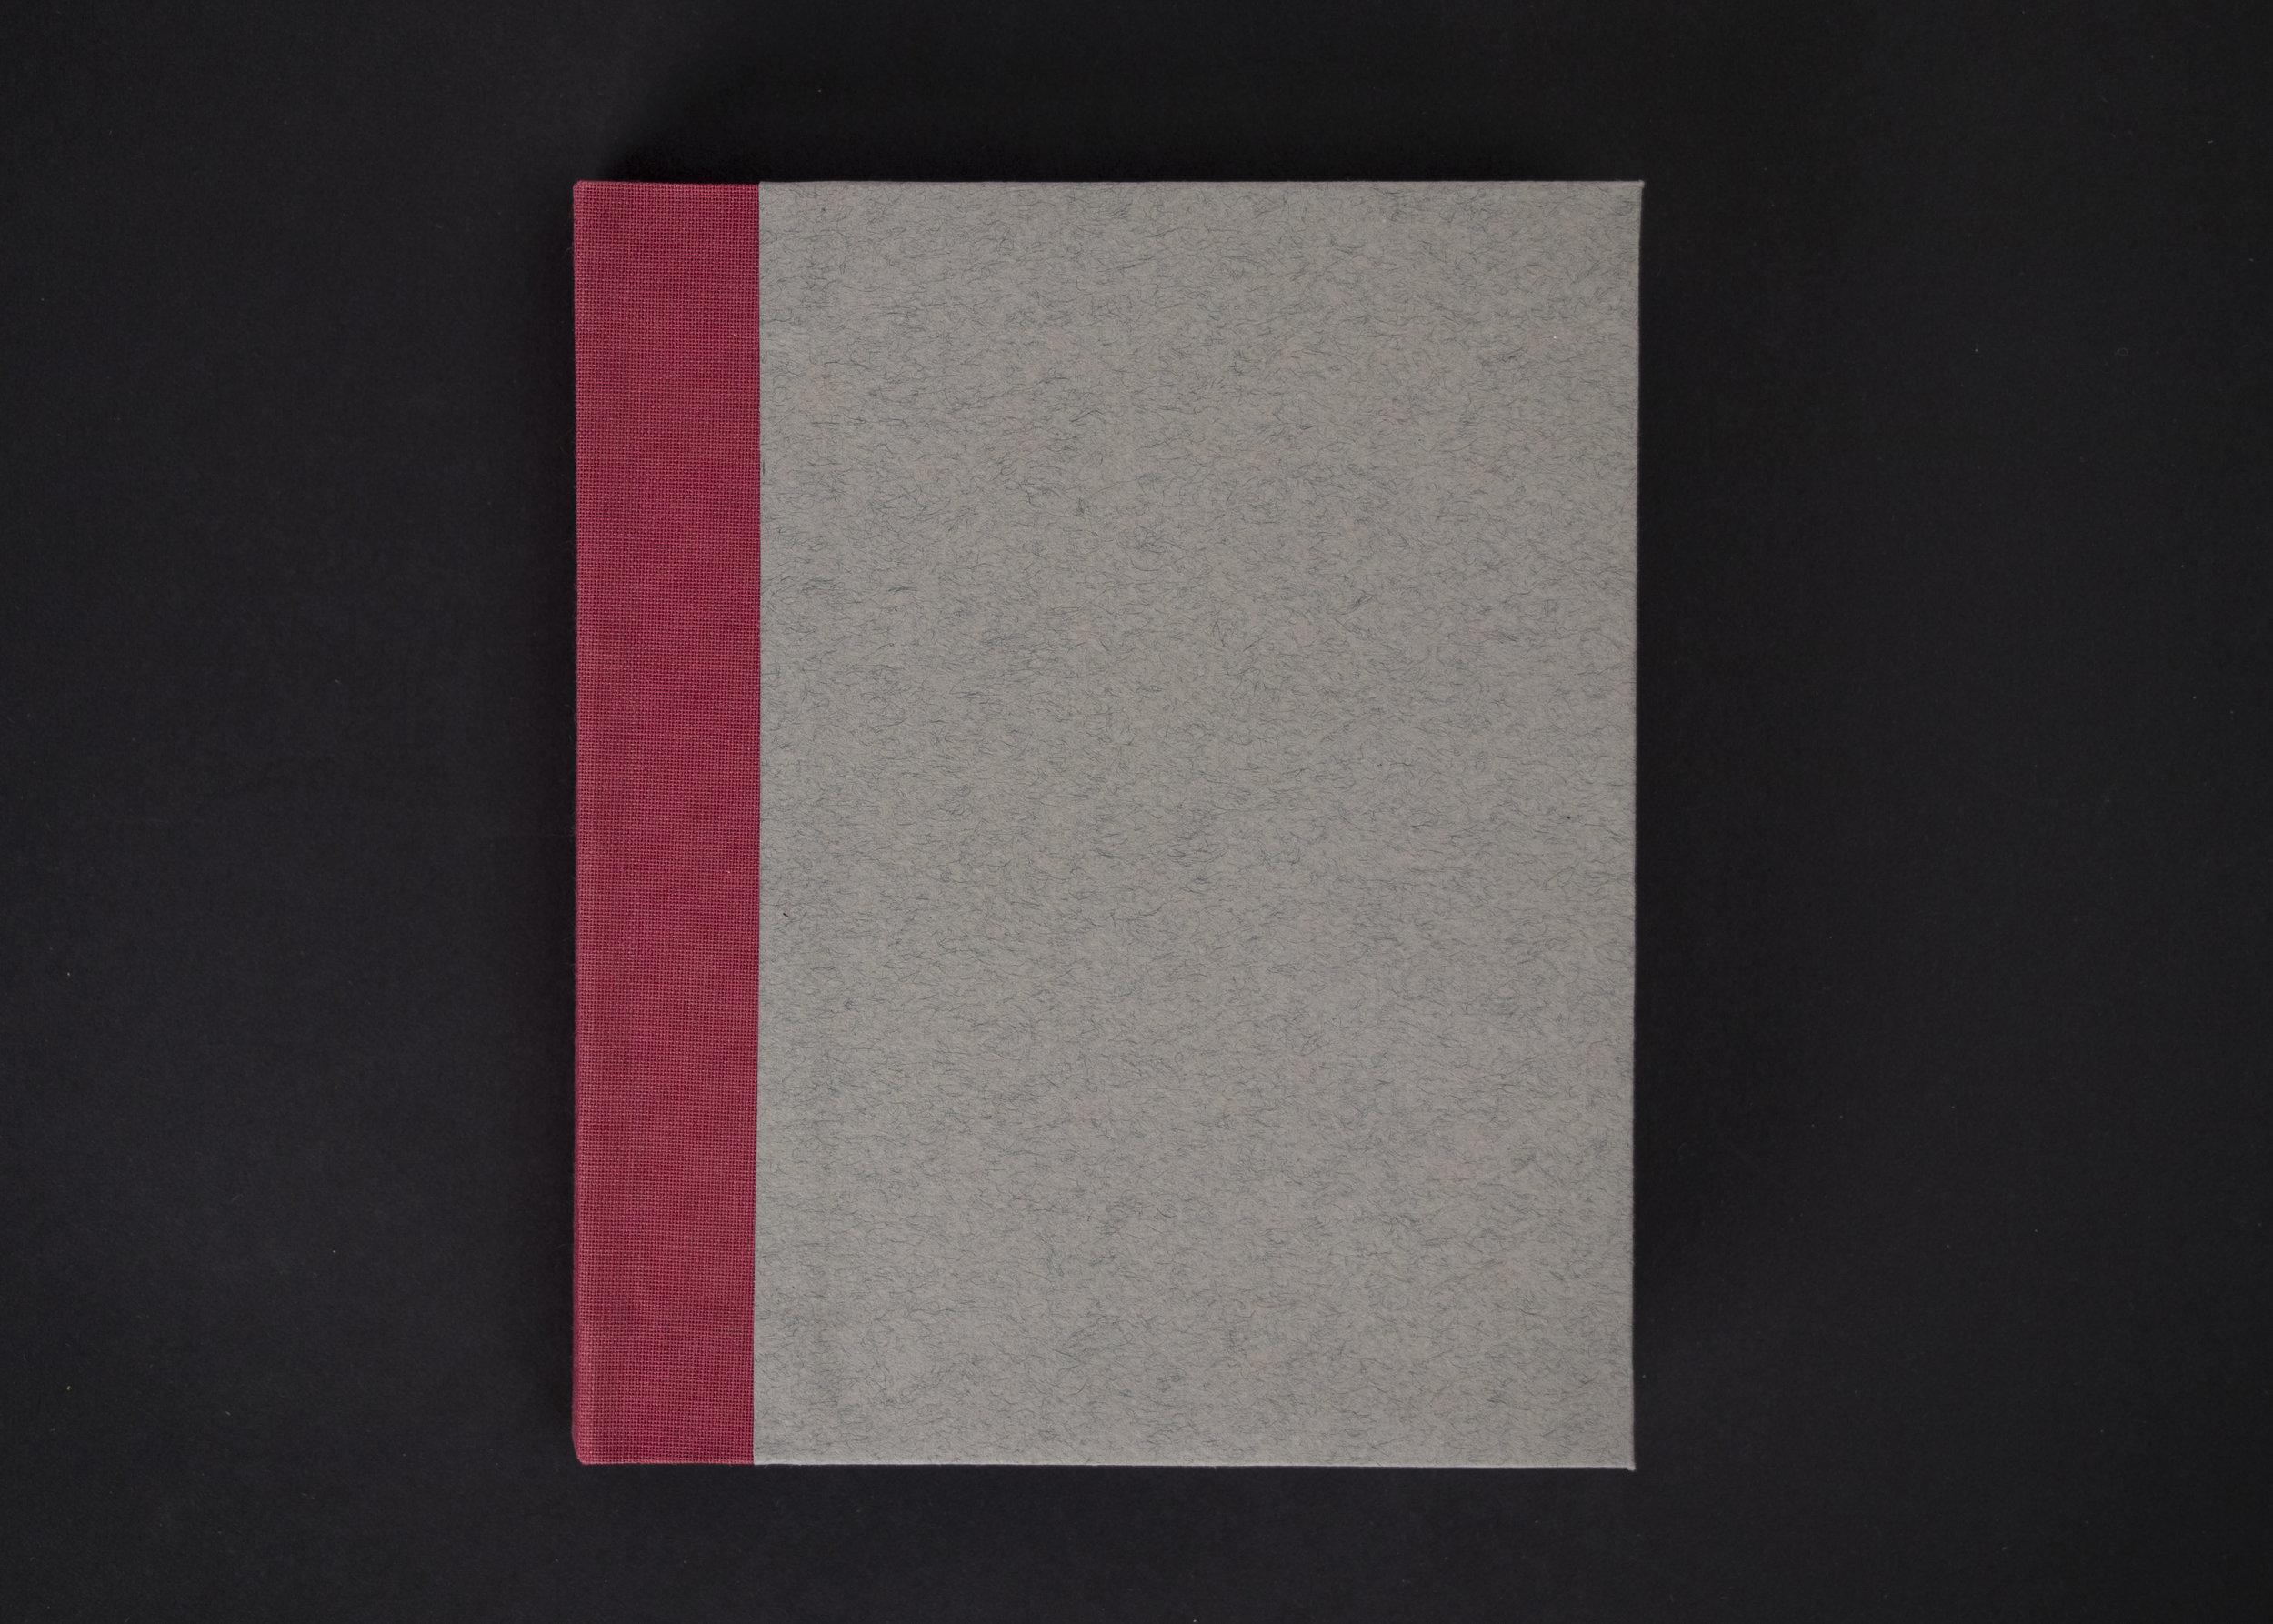 Book_IV10.JPG